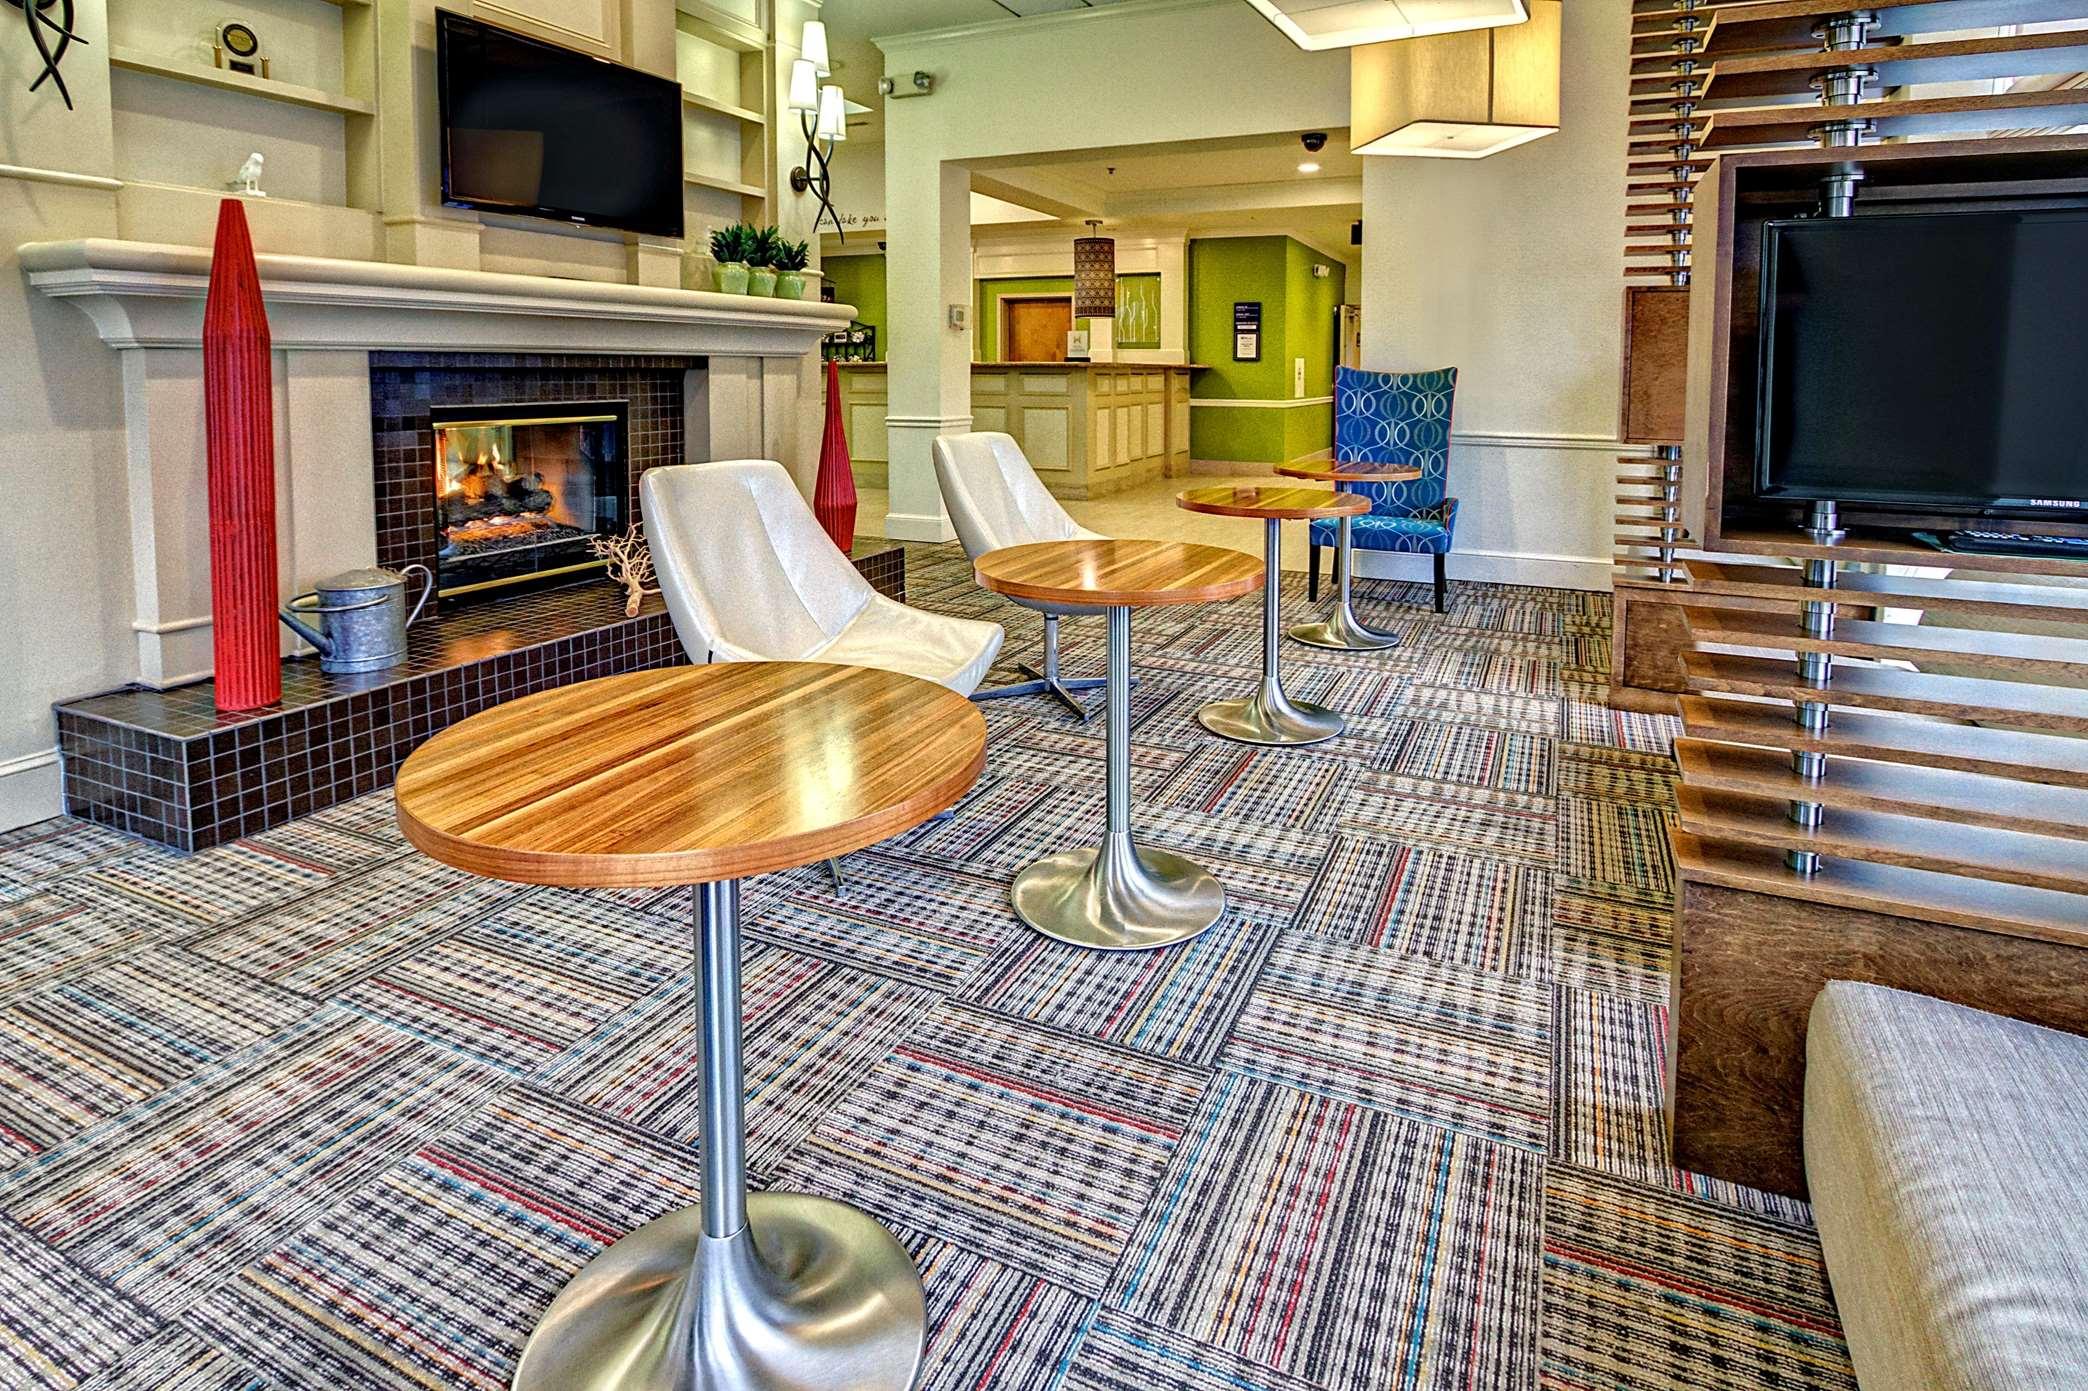 Hilton Garden Inn Nashville Airport image 1